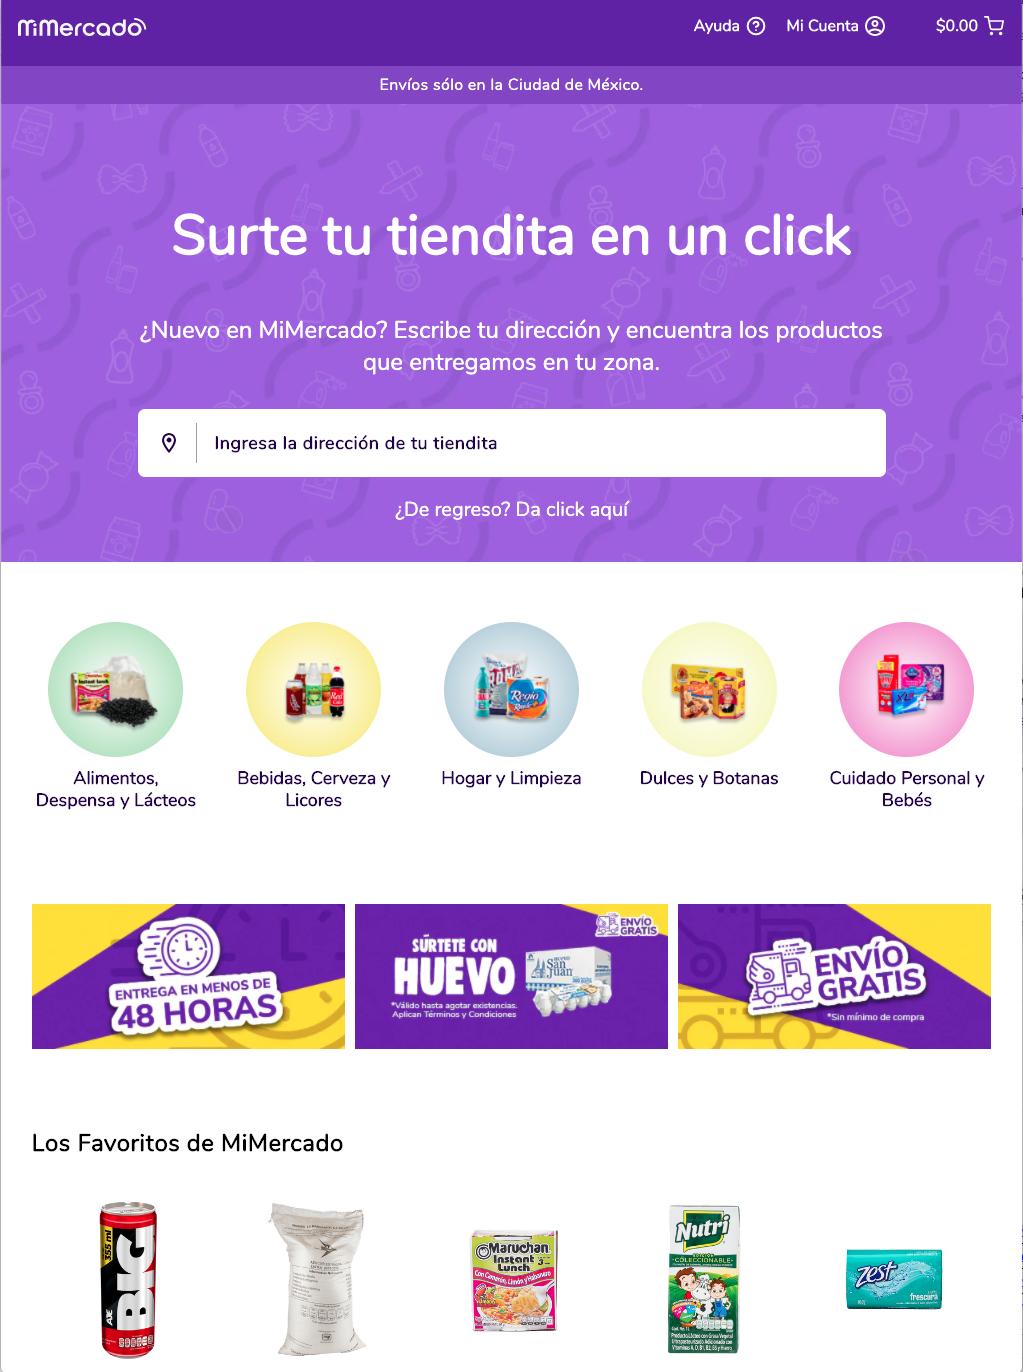 The MiMercado Marketplace Progressive Web Application